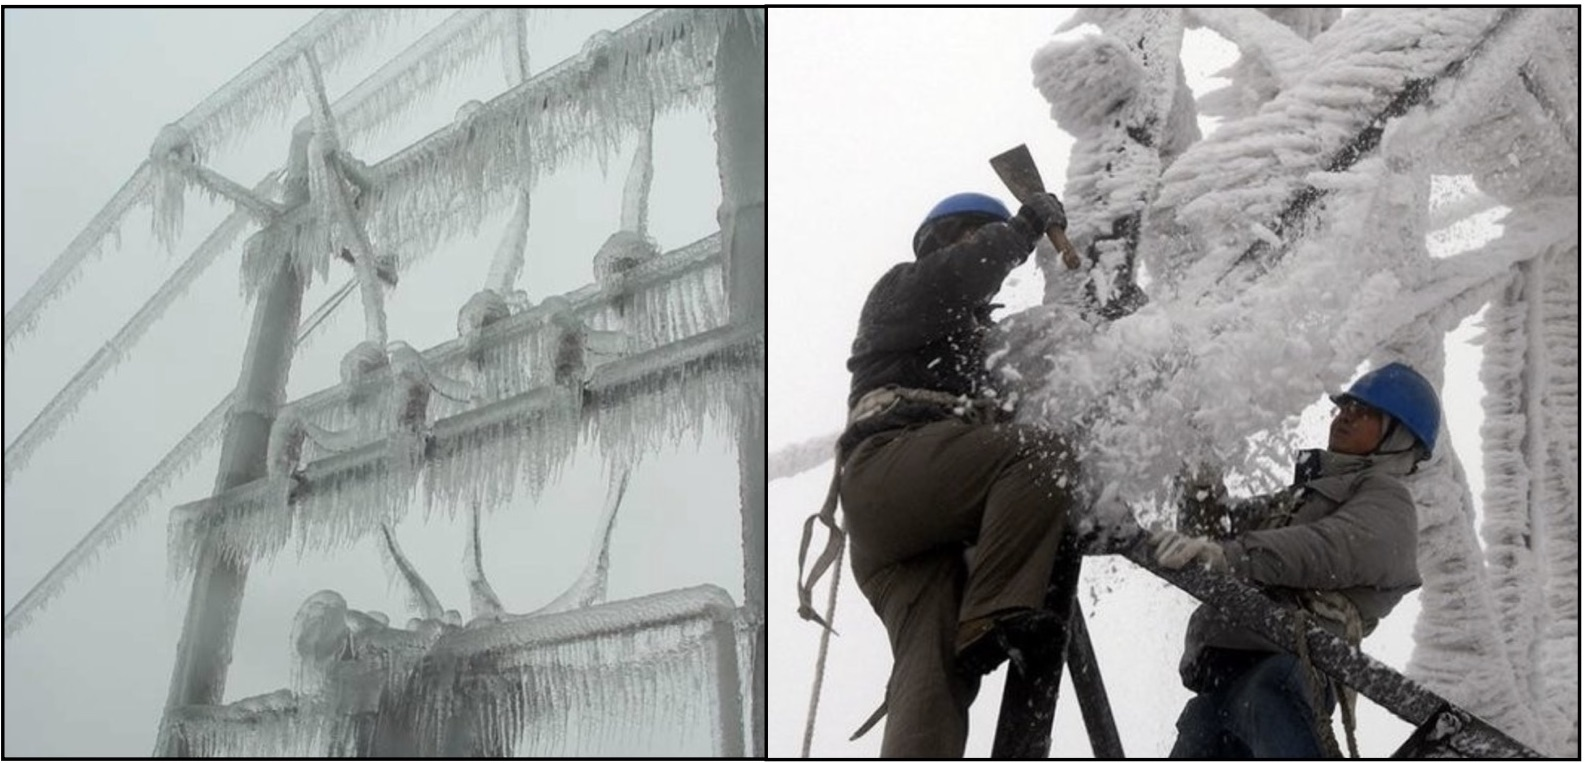 iced-power-transformer-winter-storm-2008-2.jpg